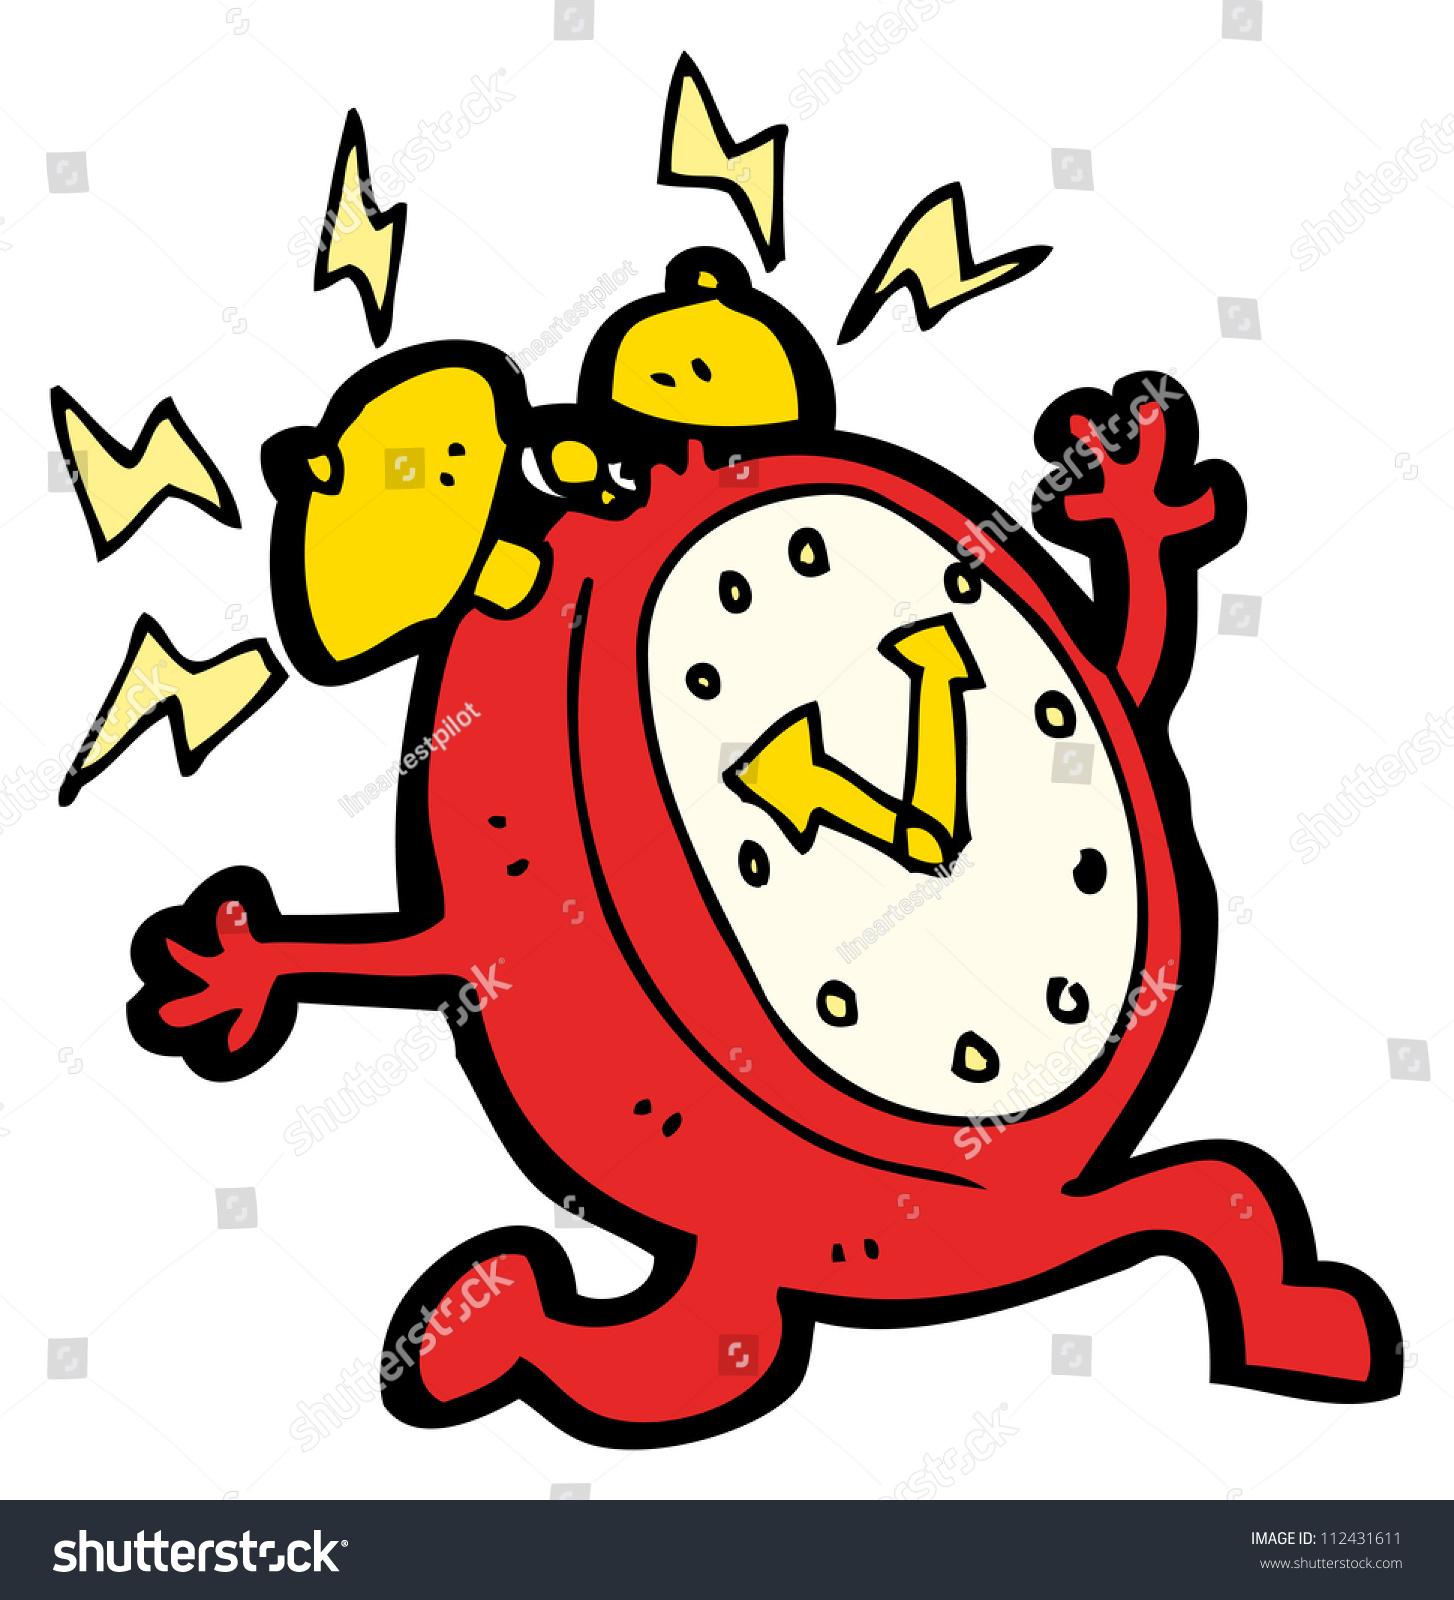 alarm clock cartoon character stock illustration 112431611 ping pong clip art black and white ping pong clipart black and white